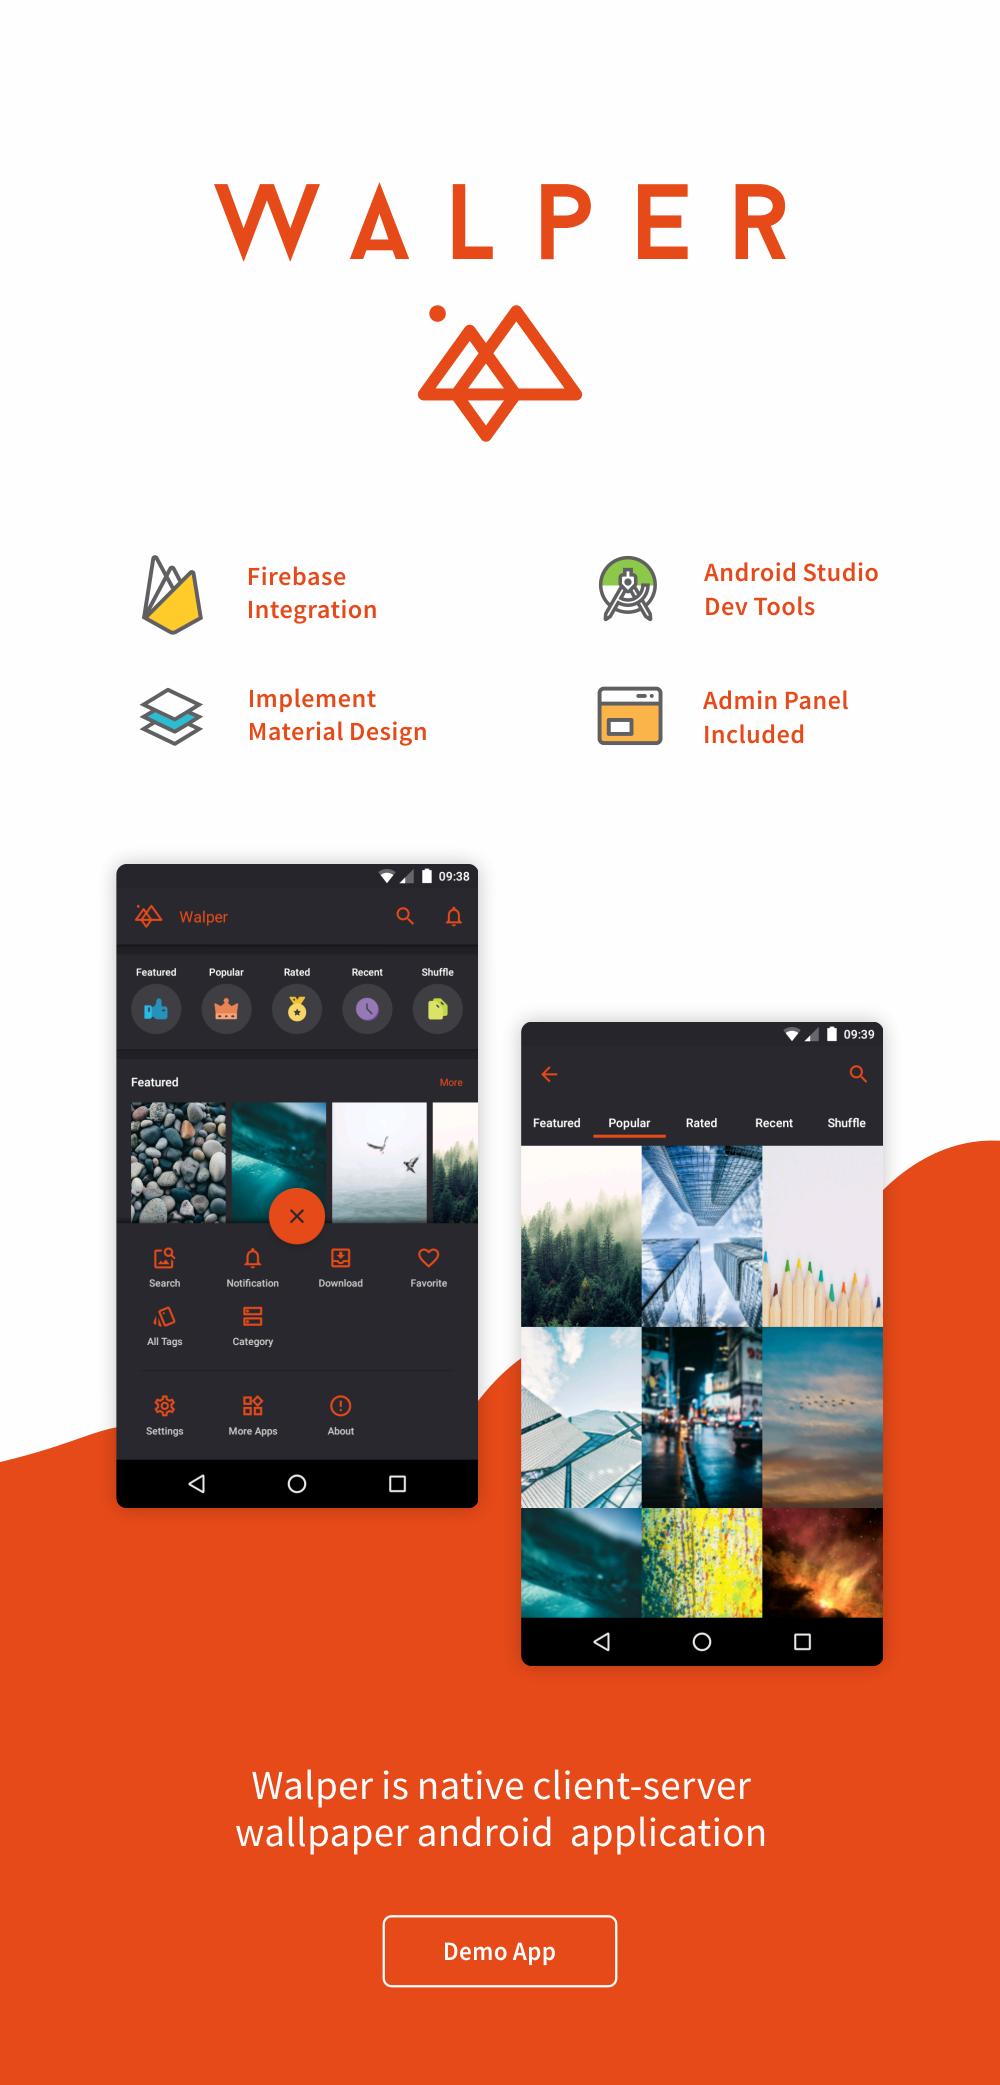 Walper - Wallpaper Android Application 1.0 - 1